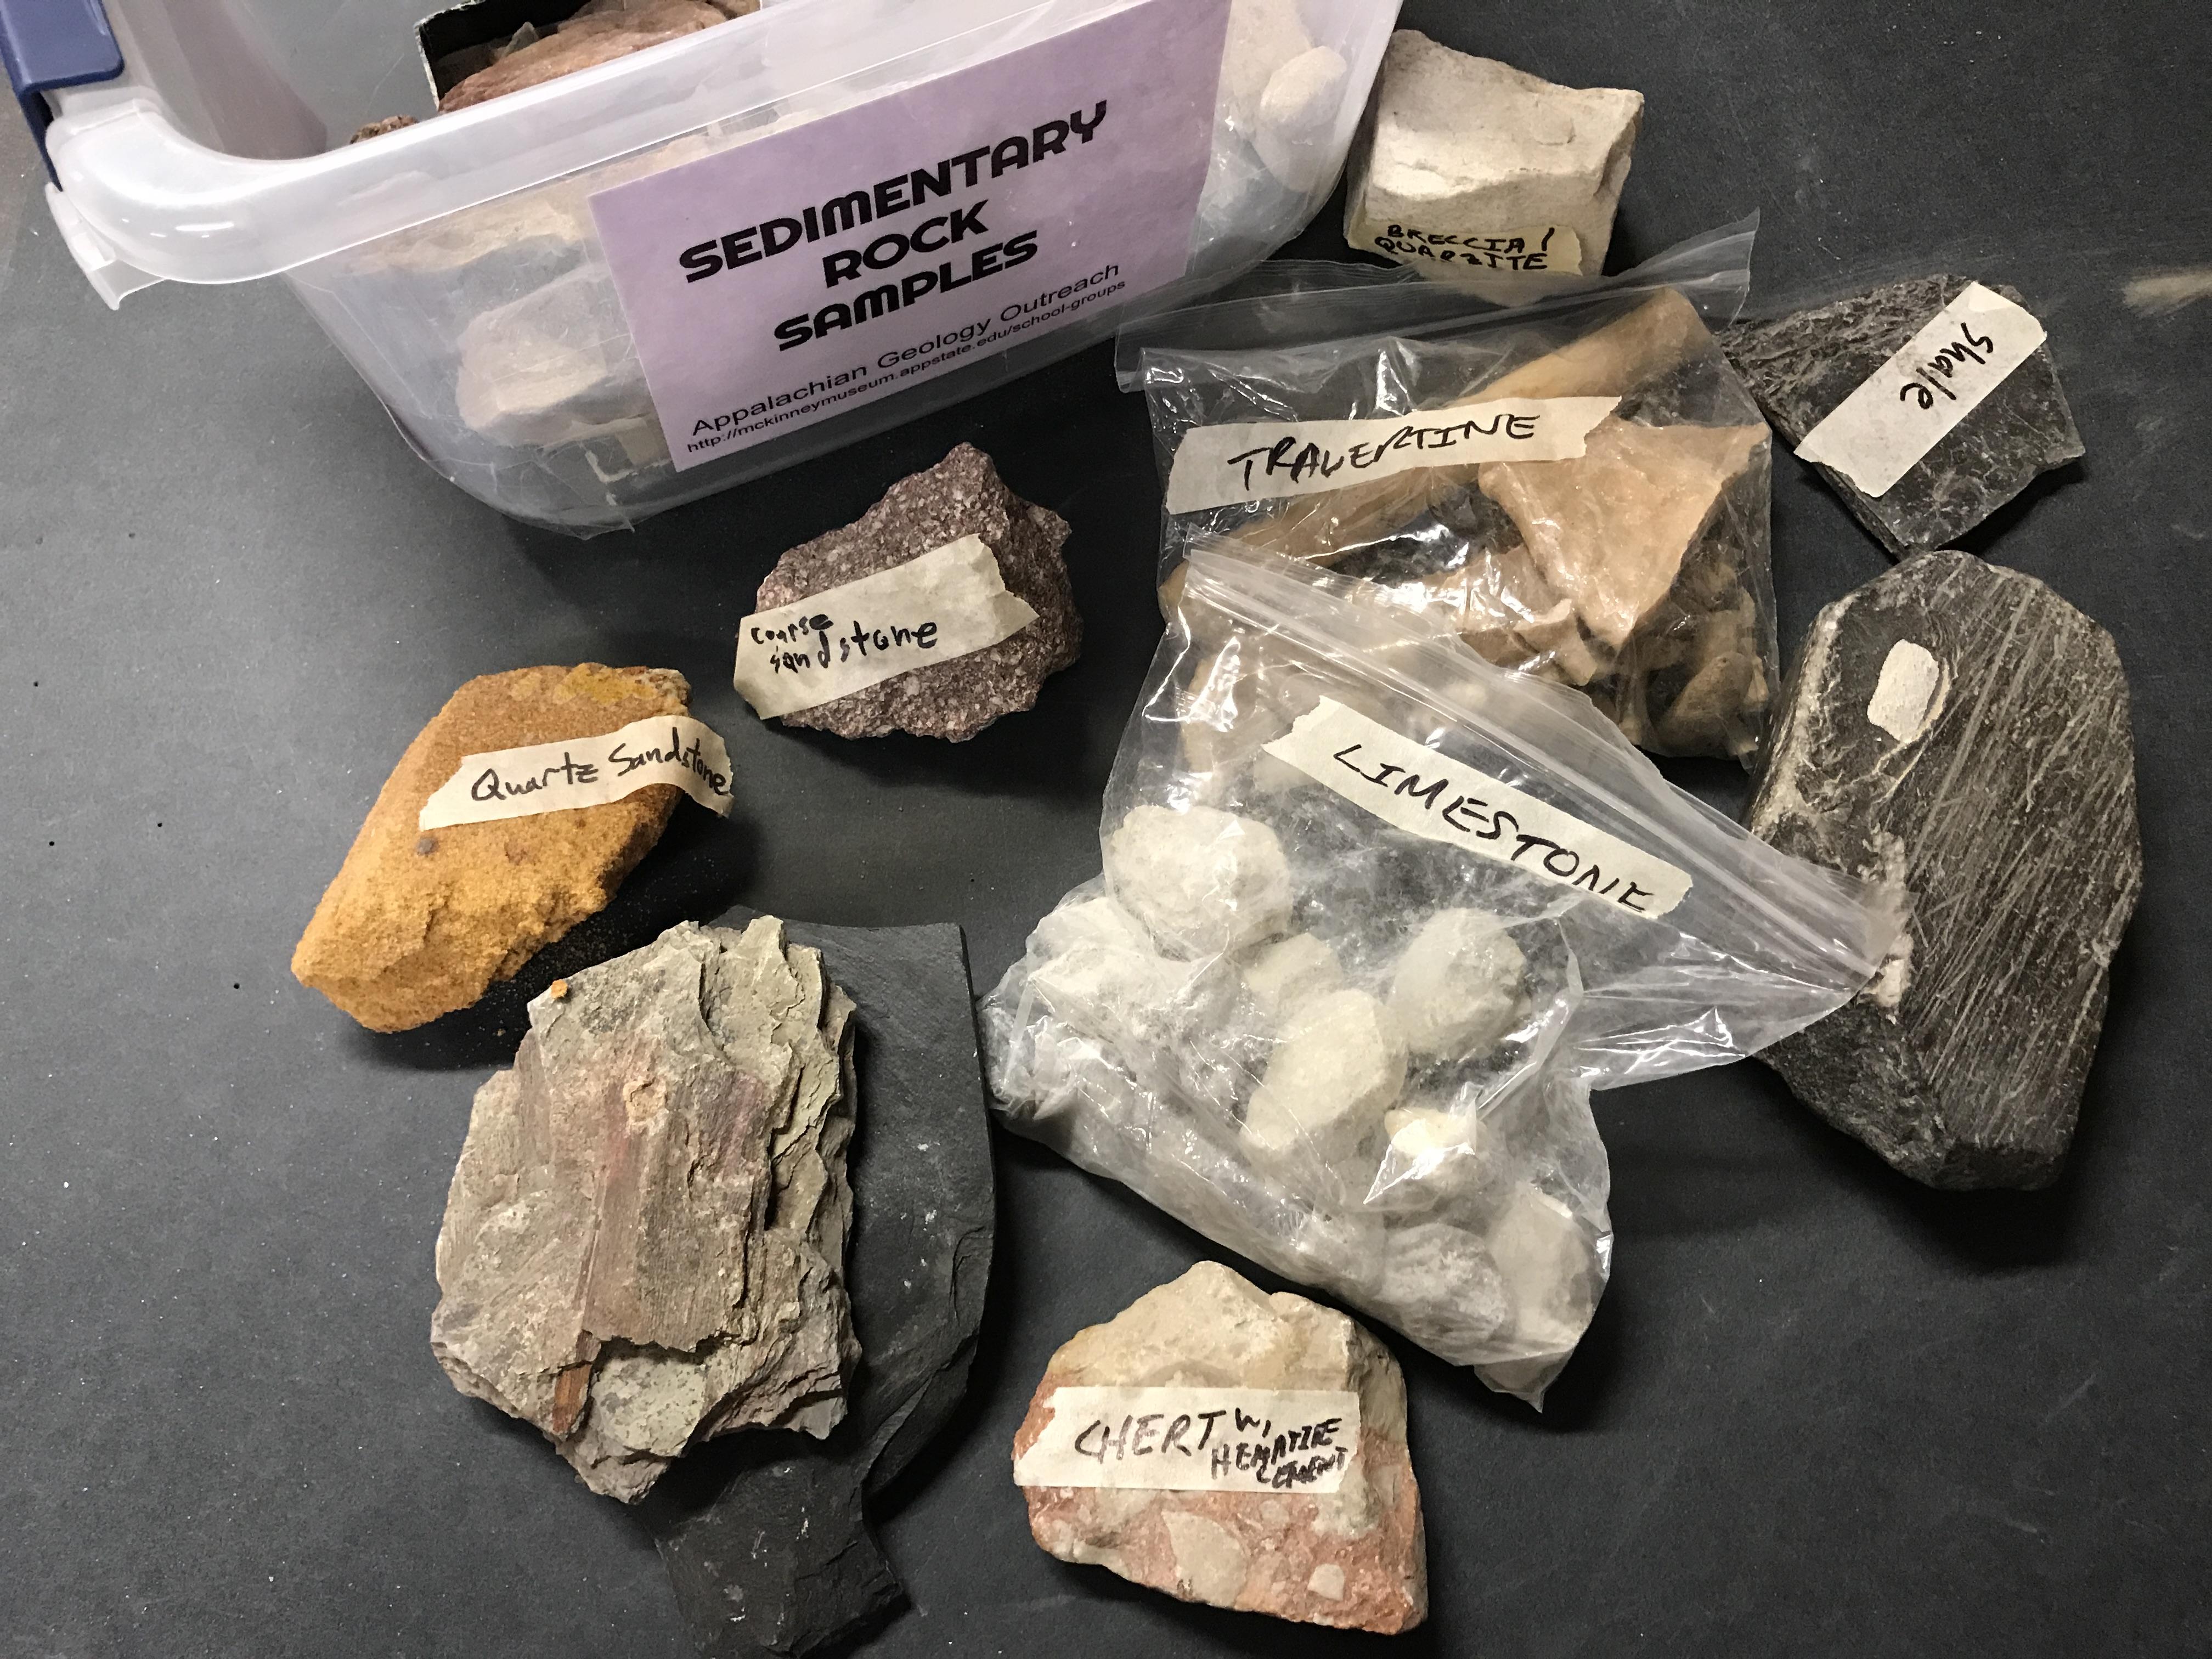 Sedimentary Rock Samples